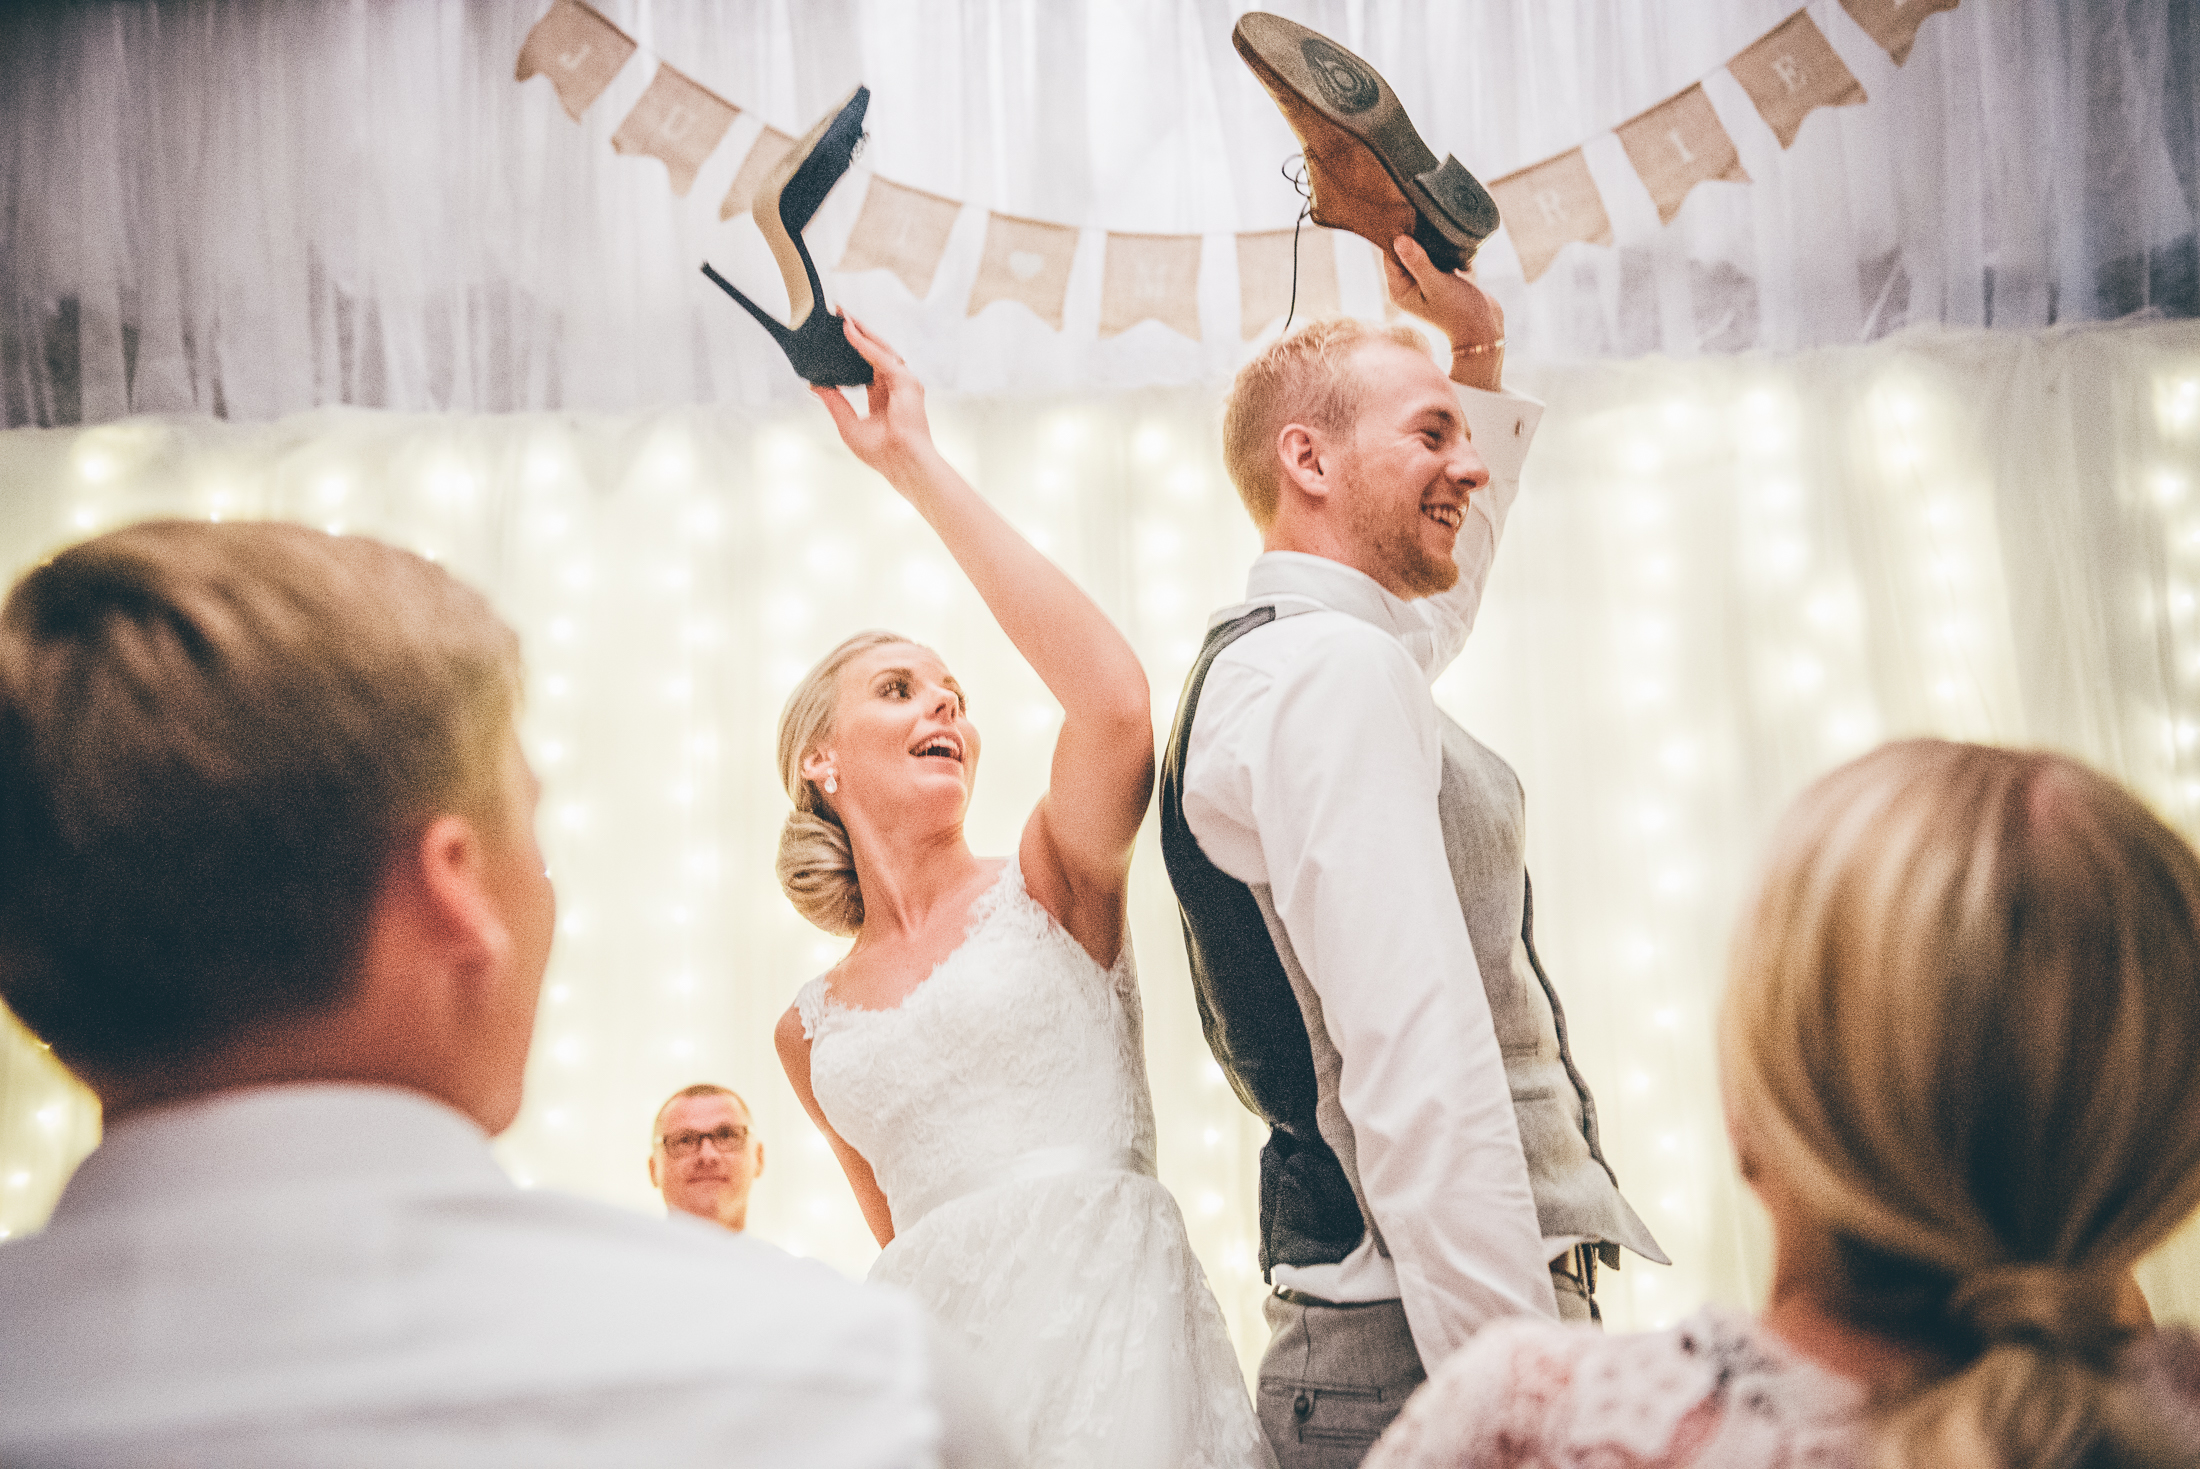 bröllop_linda_robin42.jpg